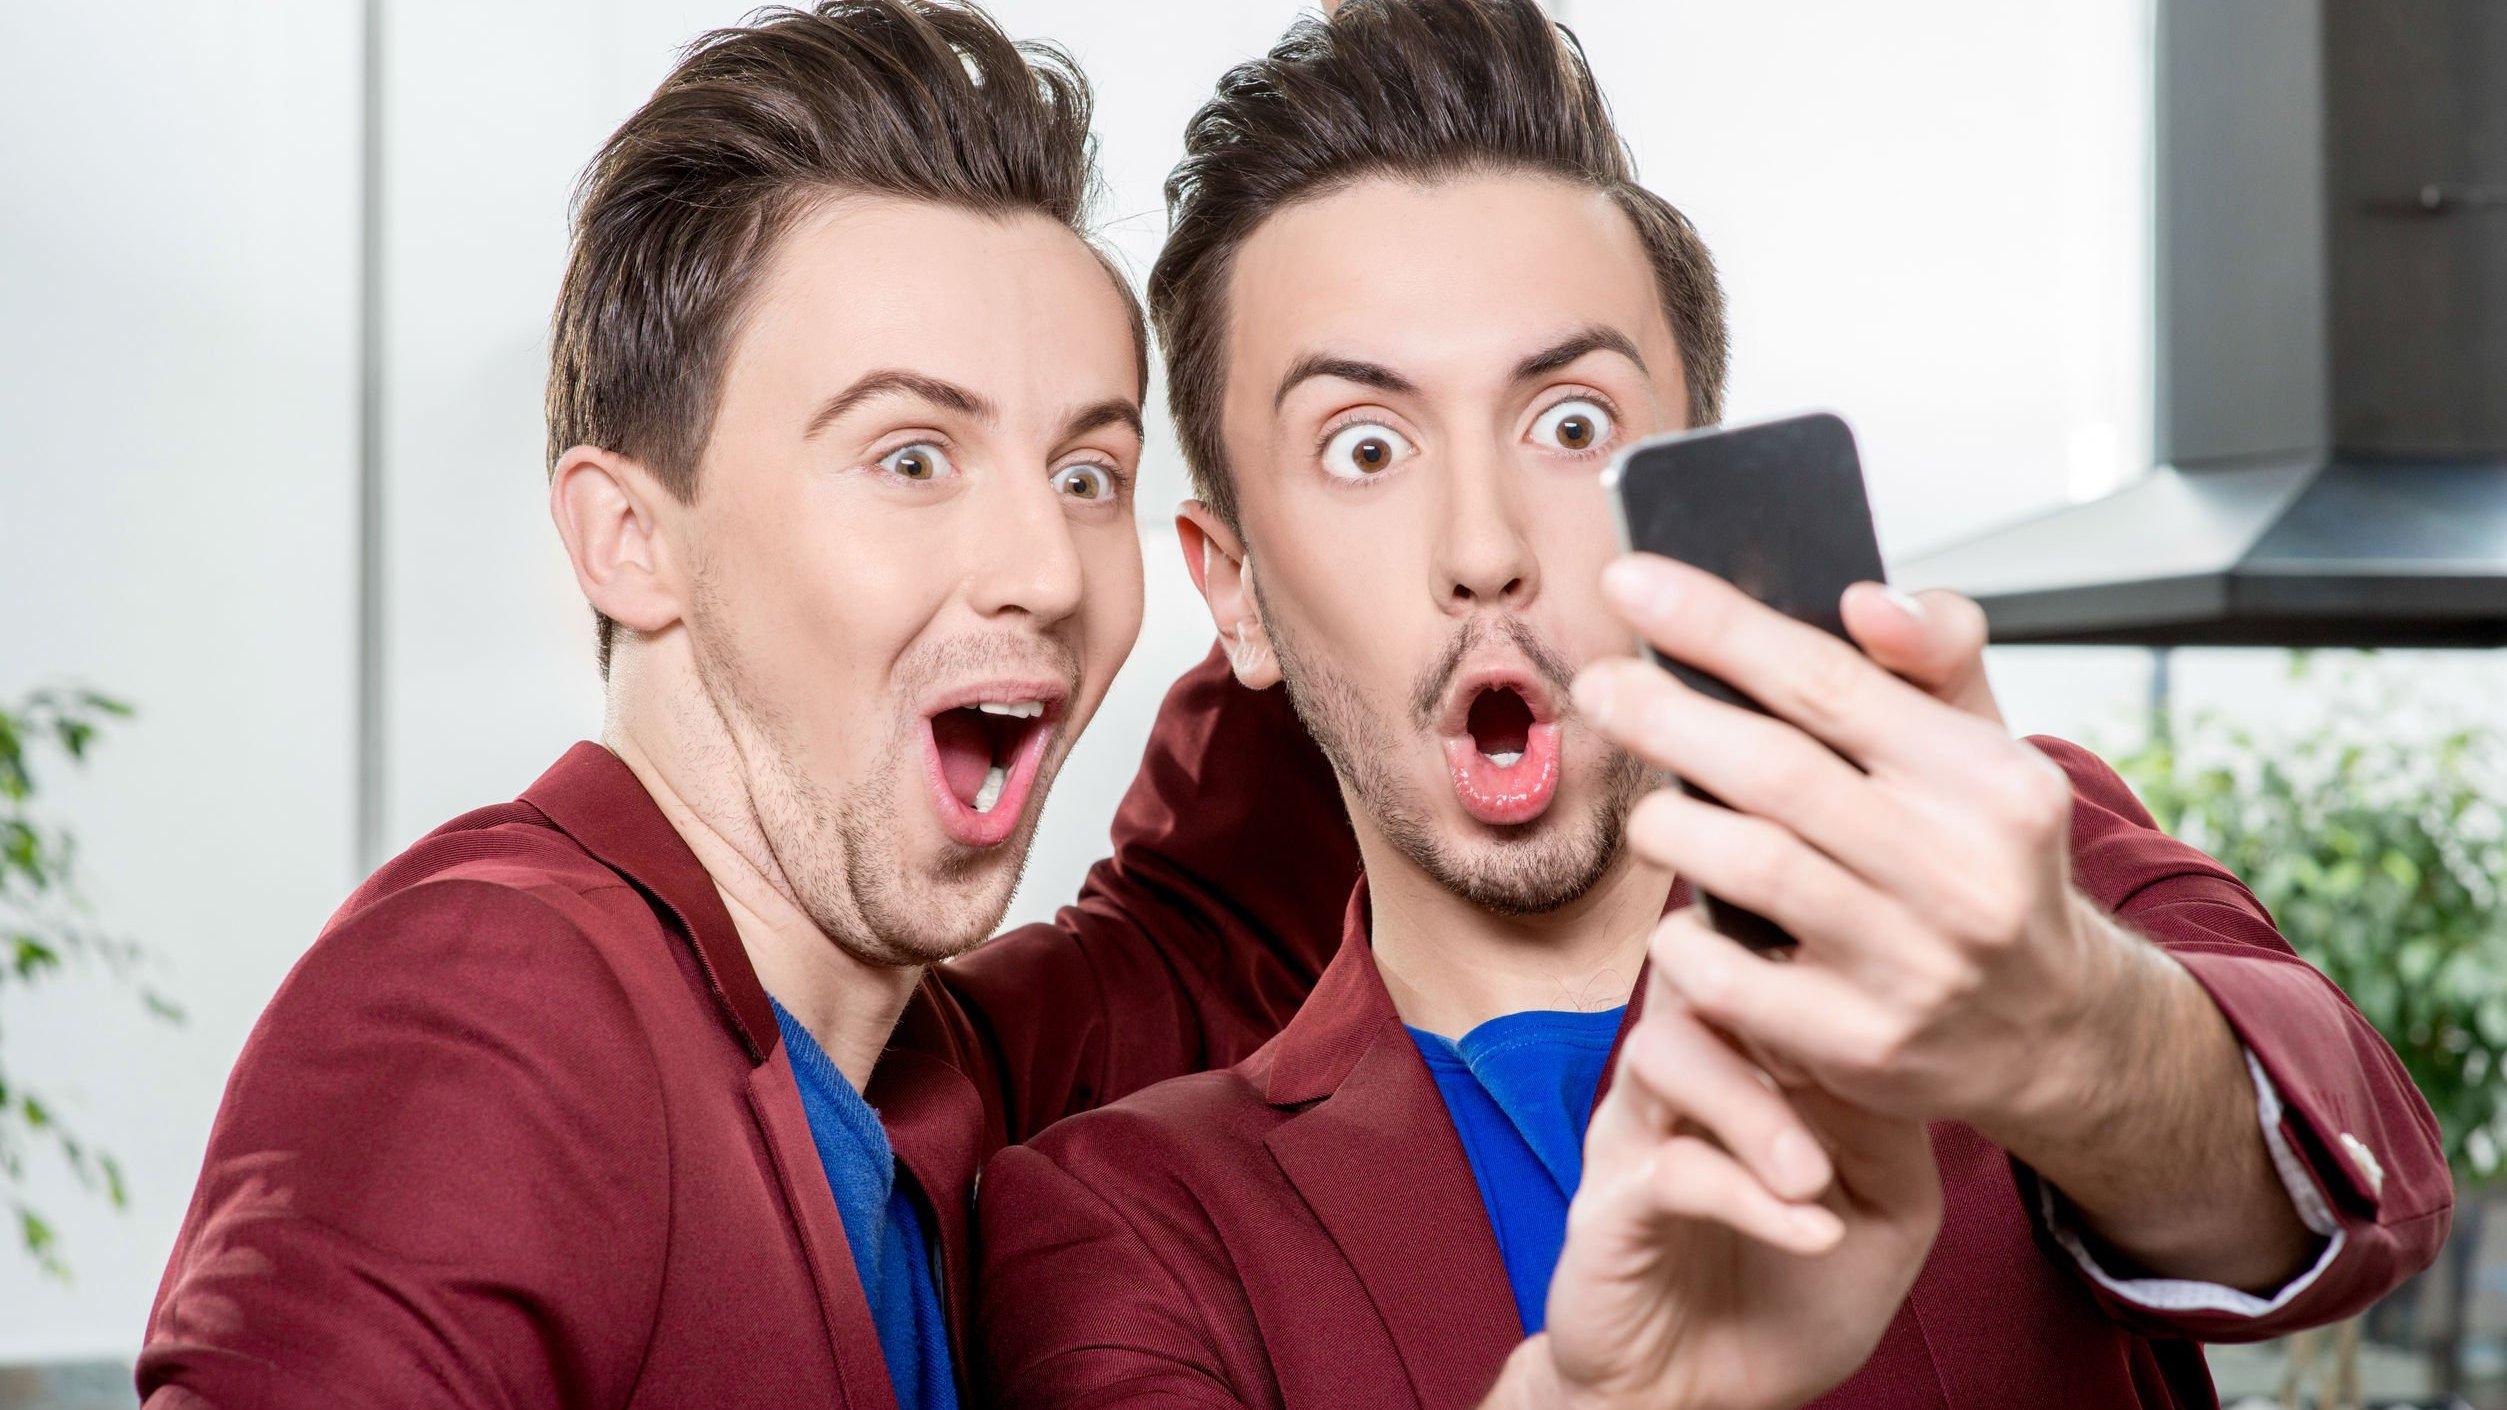 Irmãos gêmeos tirando selfie